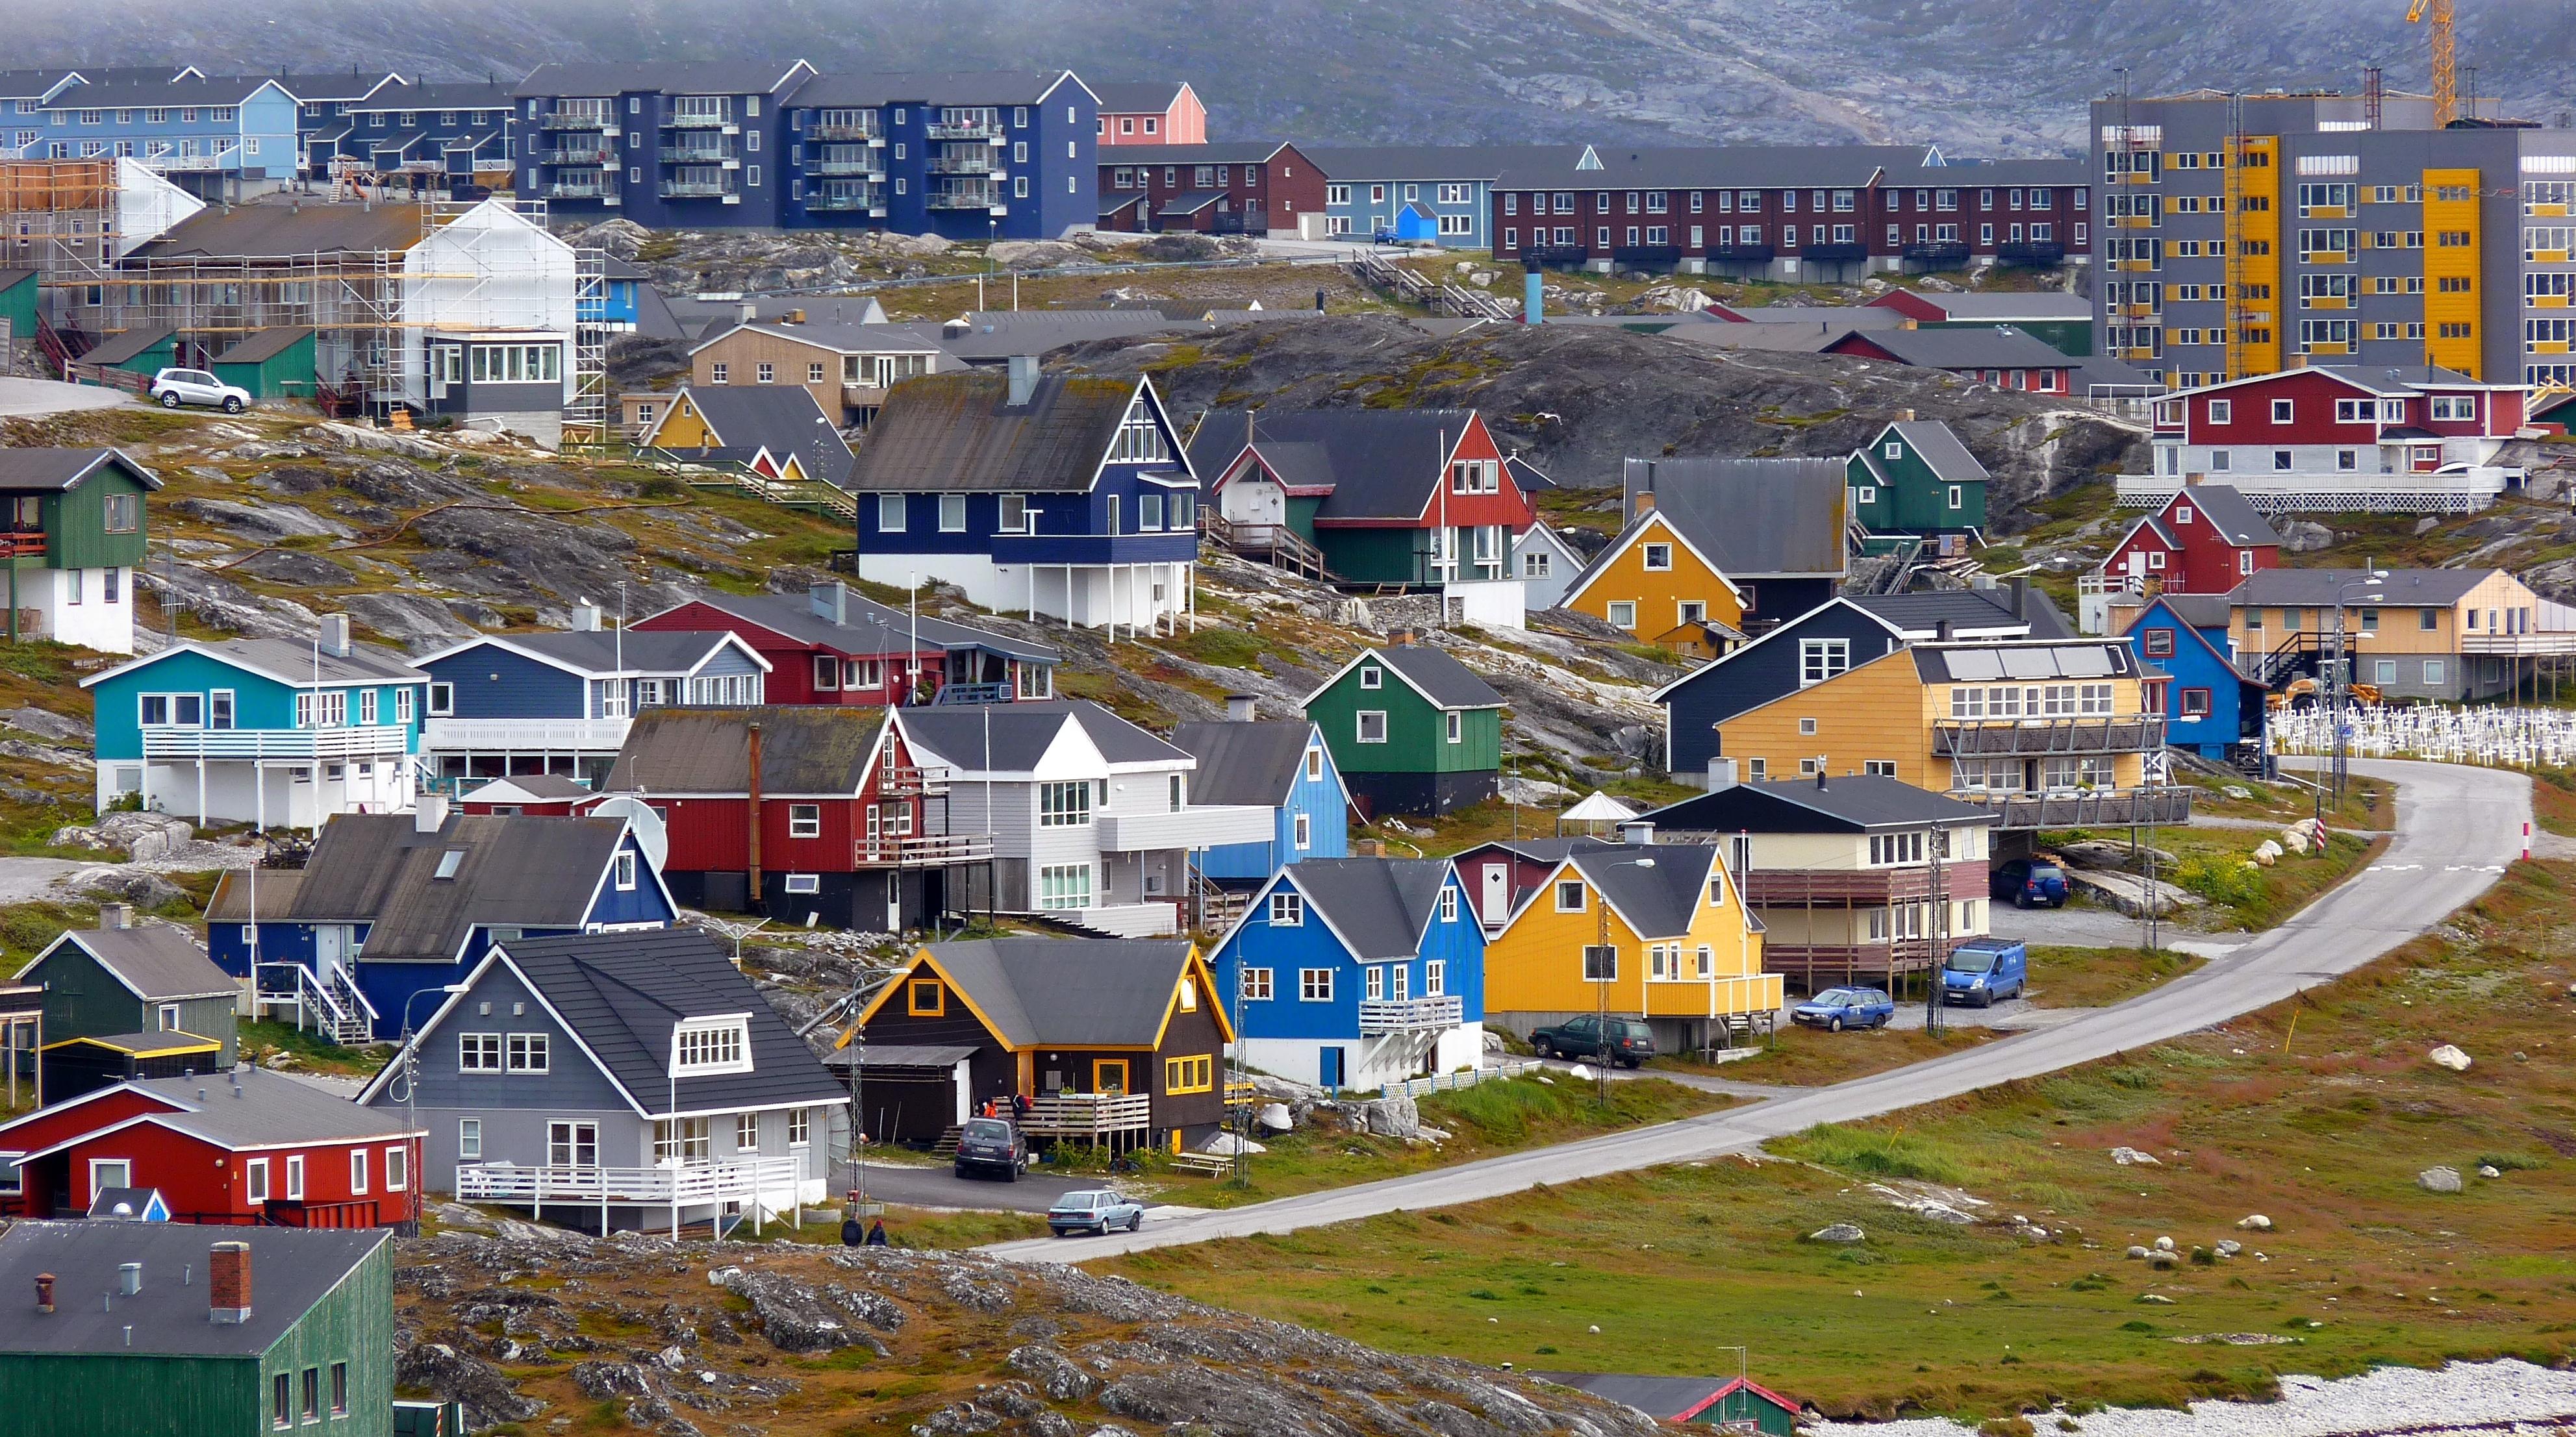 file nuuk capital of greenland panoramio jpg wikimedia commons